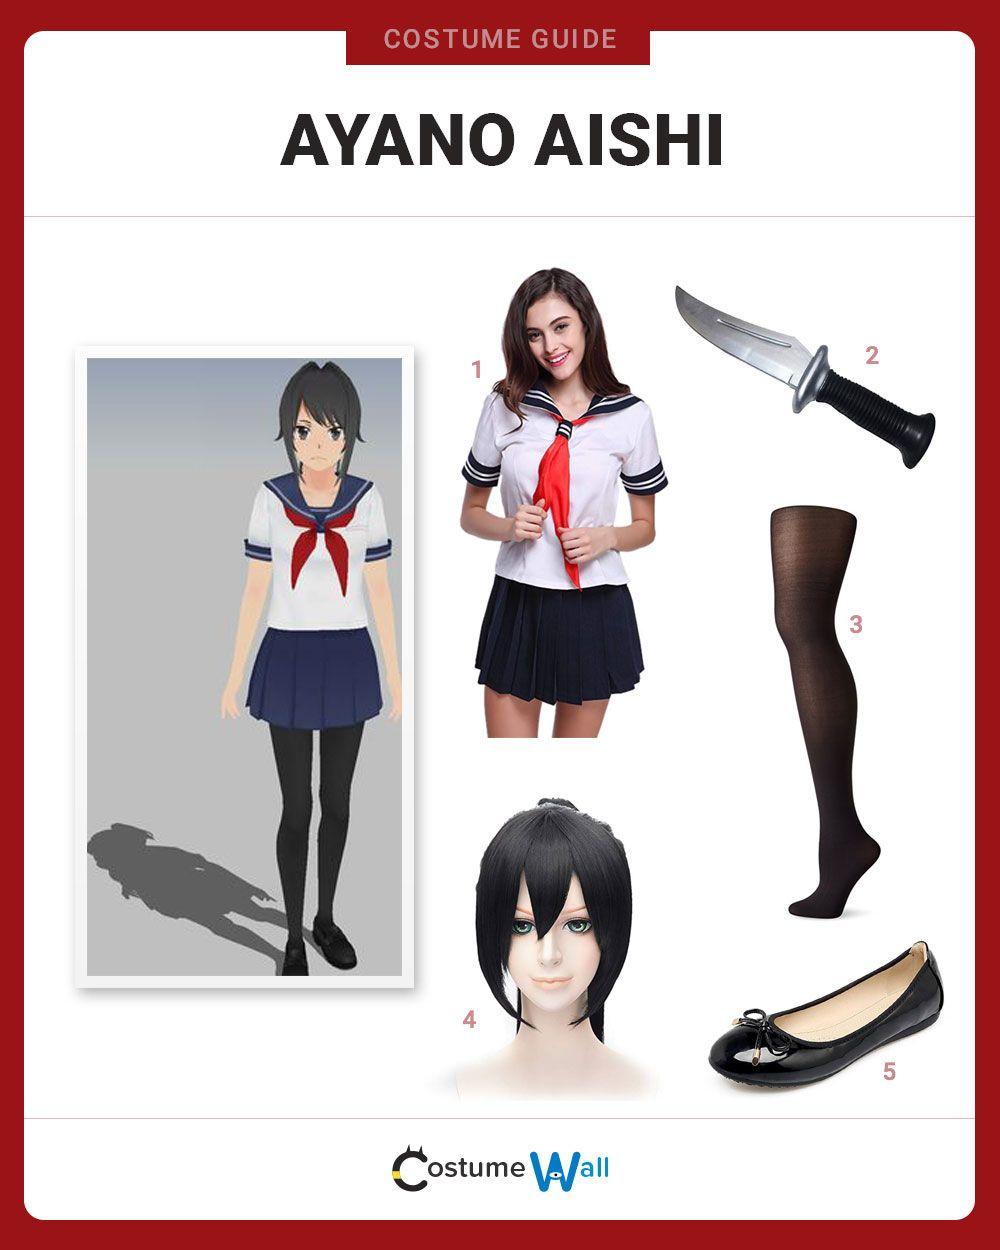 Dress Like Ayano Aishi Casual Cosplay Easy Cosplay Nerd Costumes